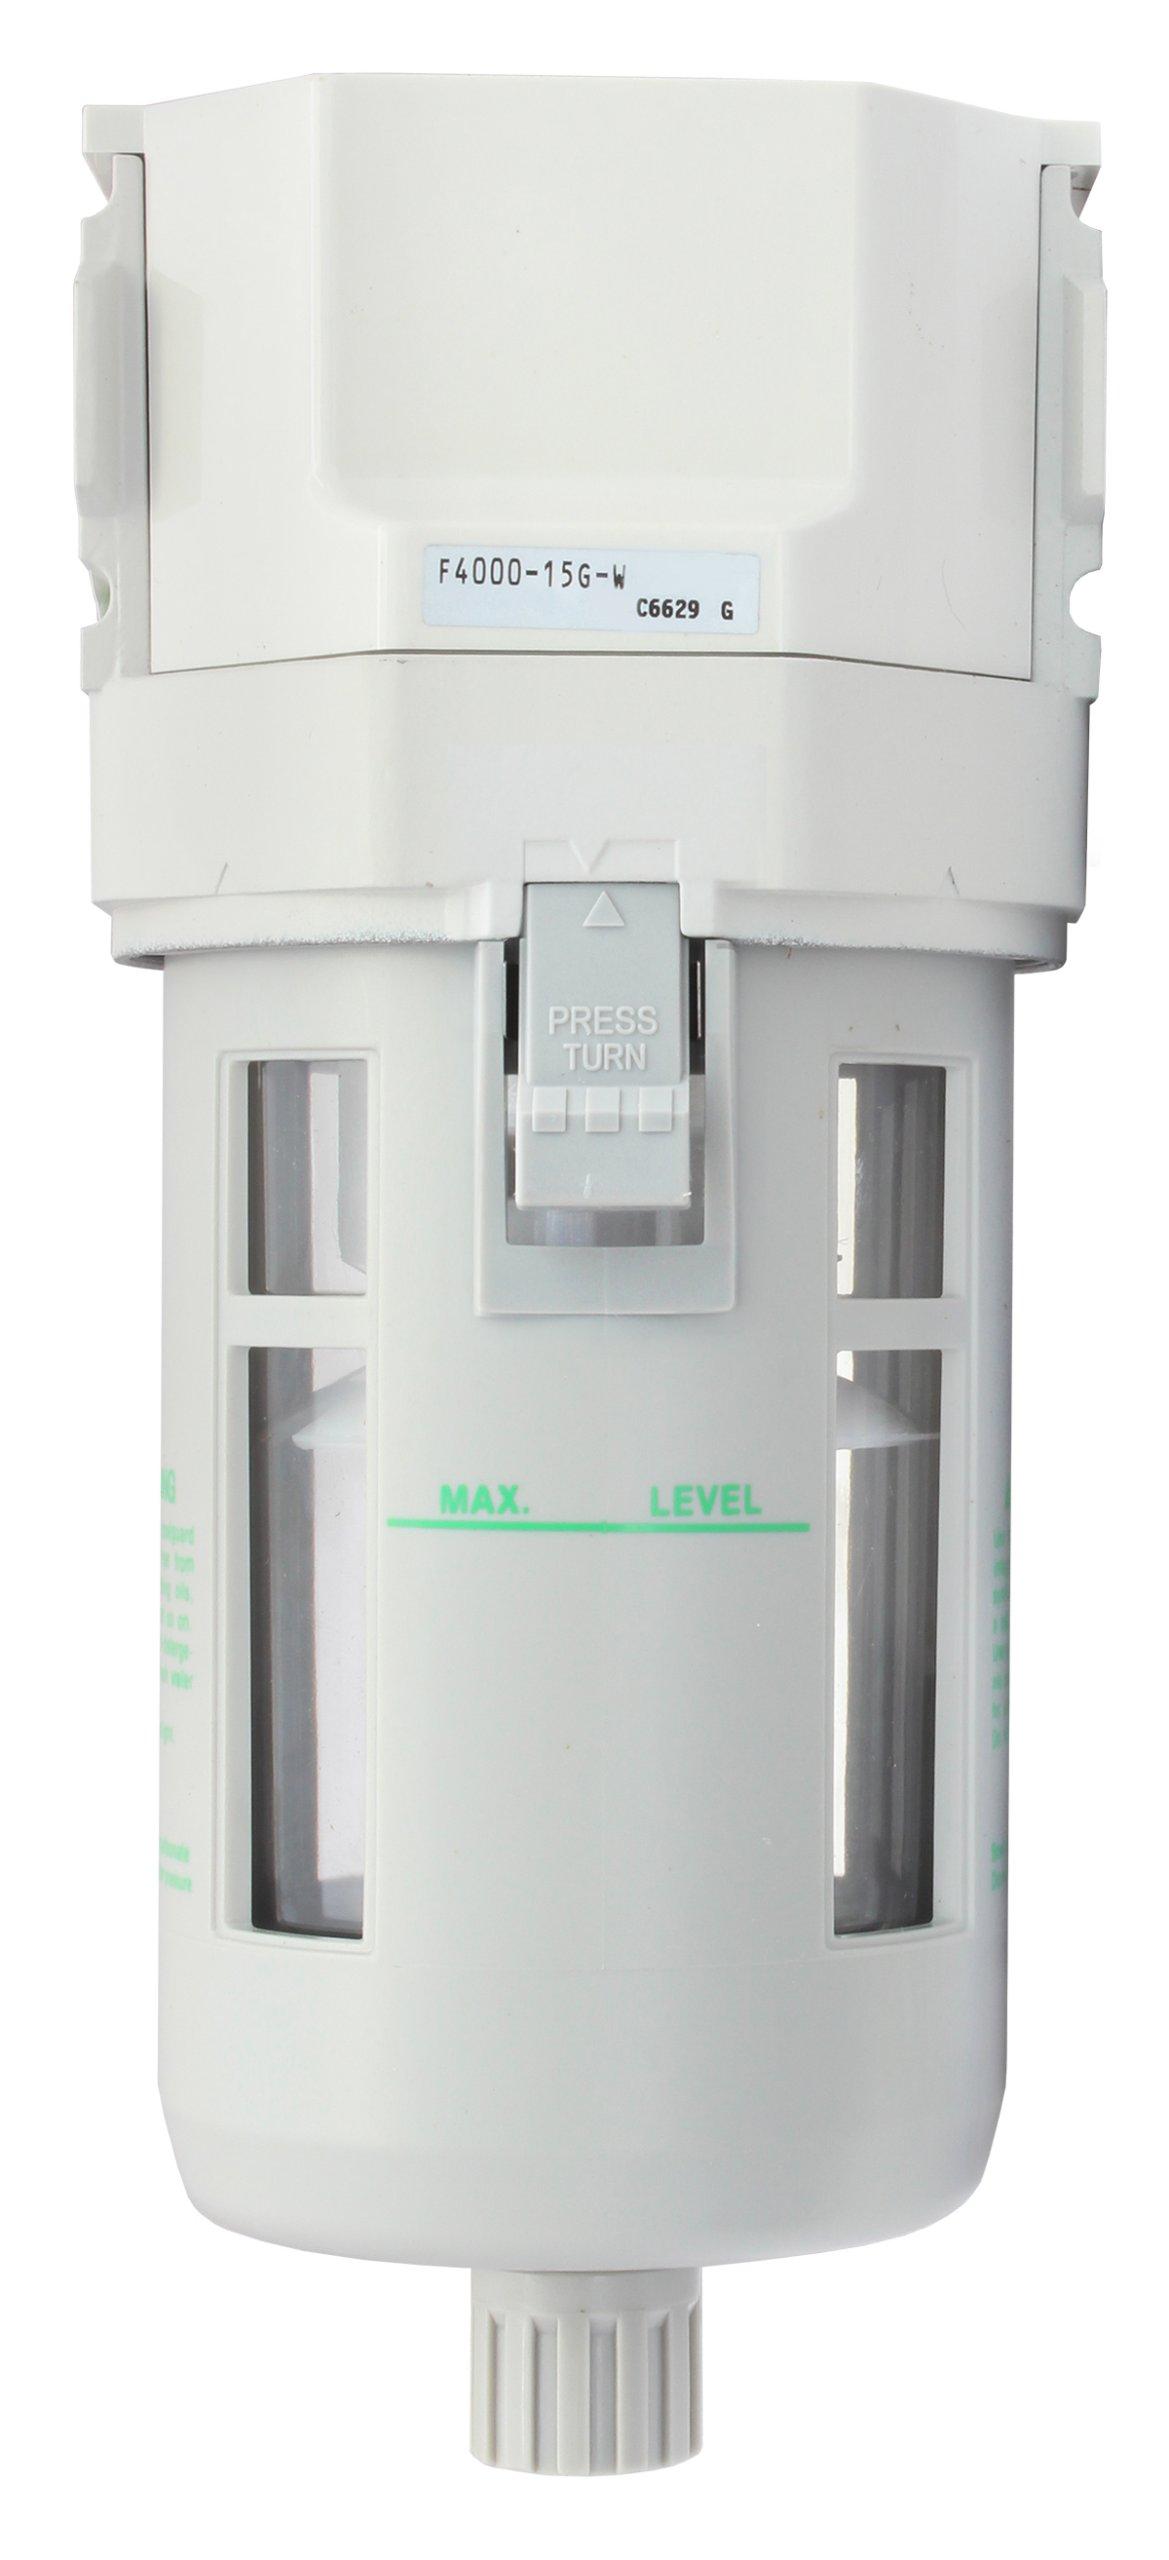 F4000 Vzduchový filter 15g 1/2 ' CKD